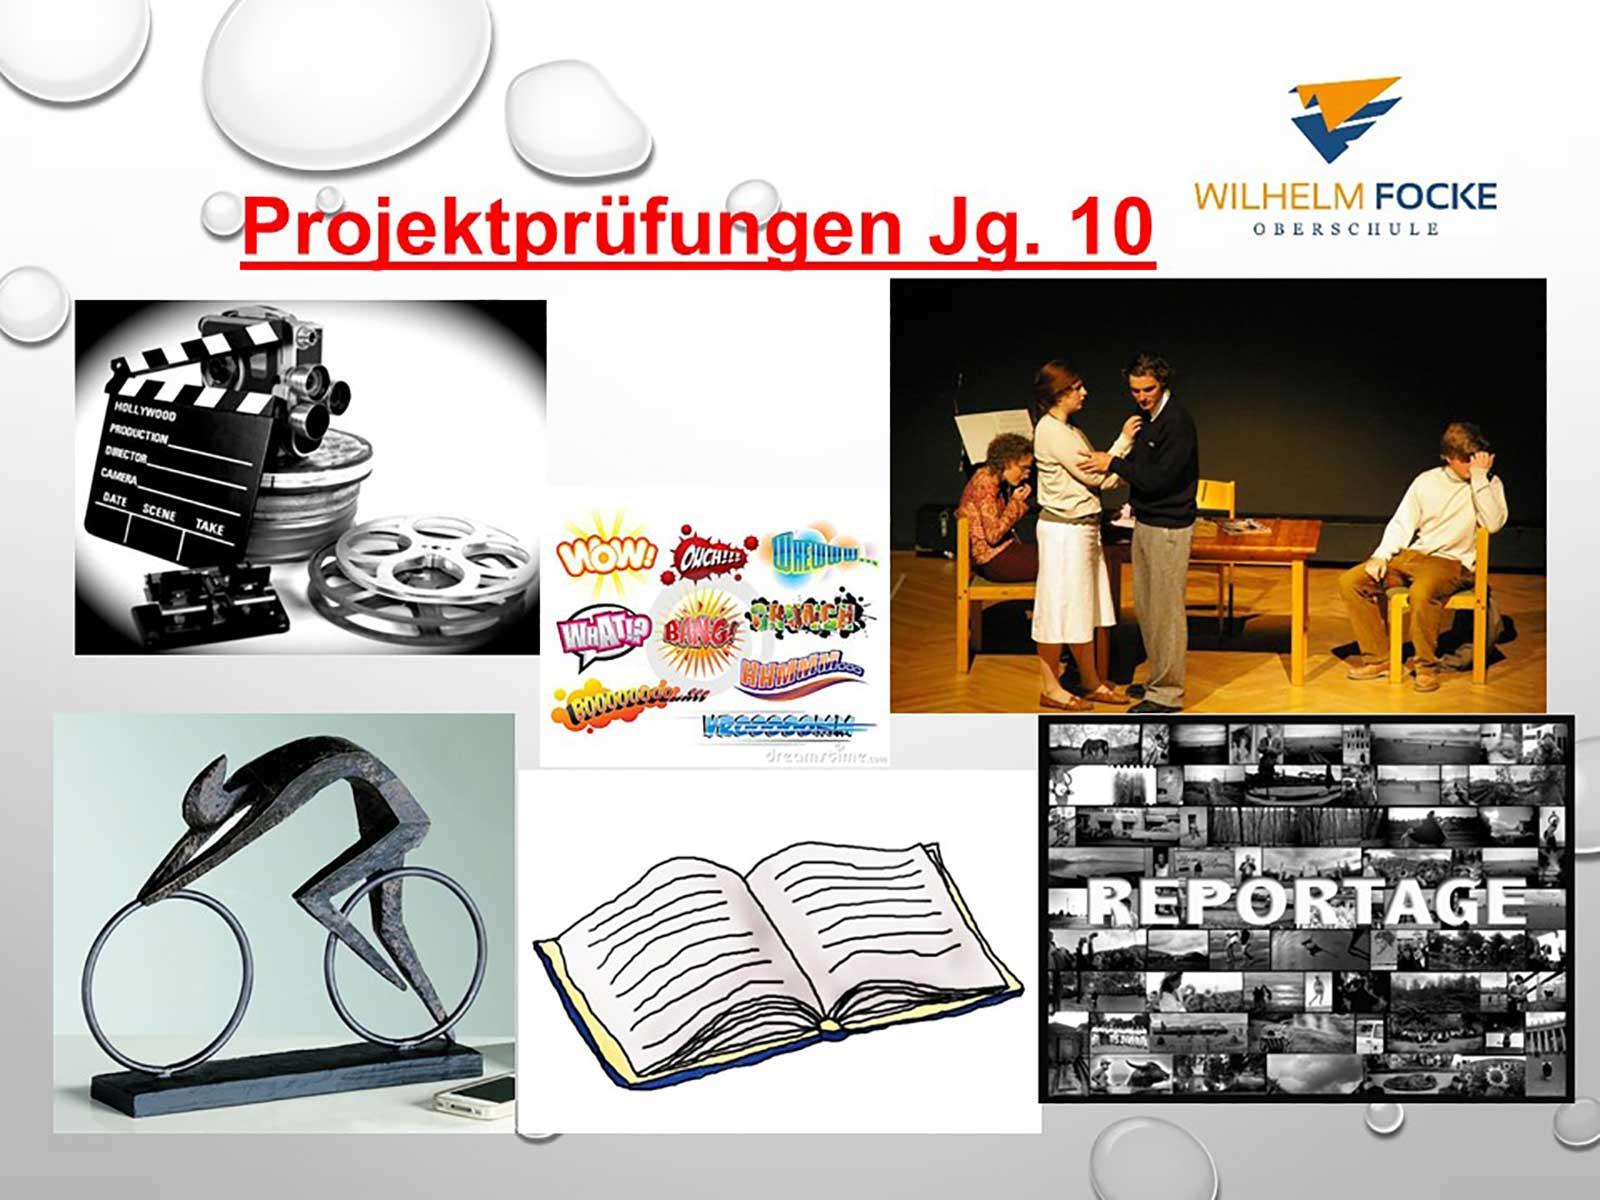 WFO: Projektprüfungen Jahrgang 10